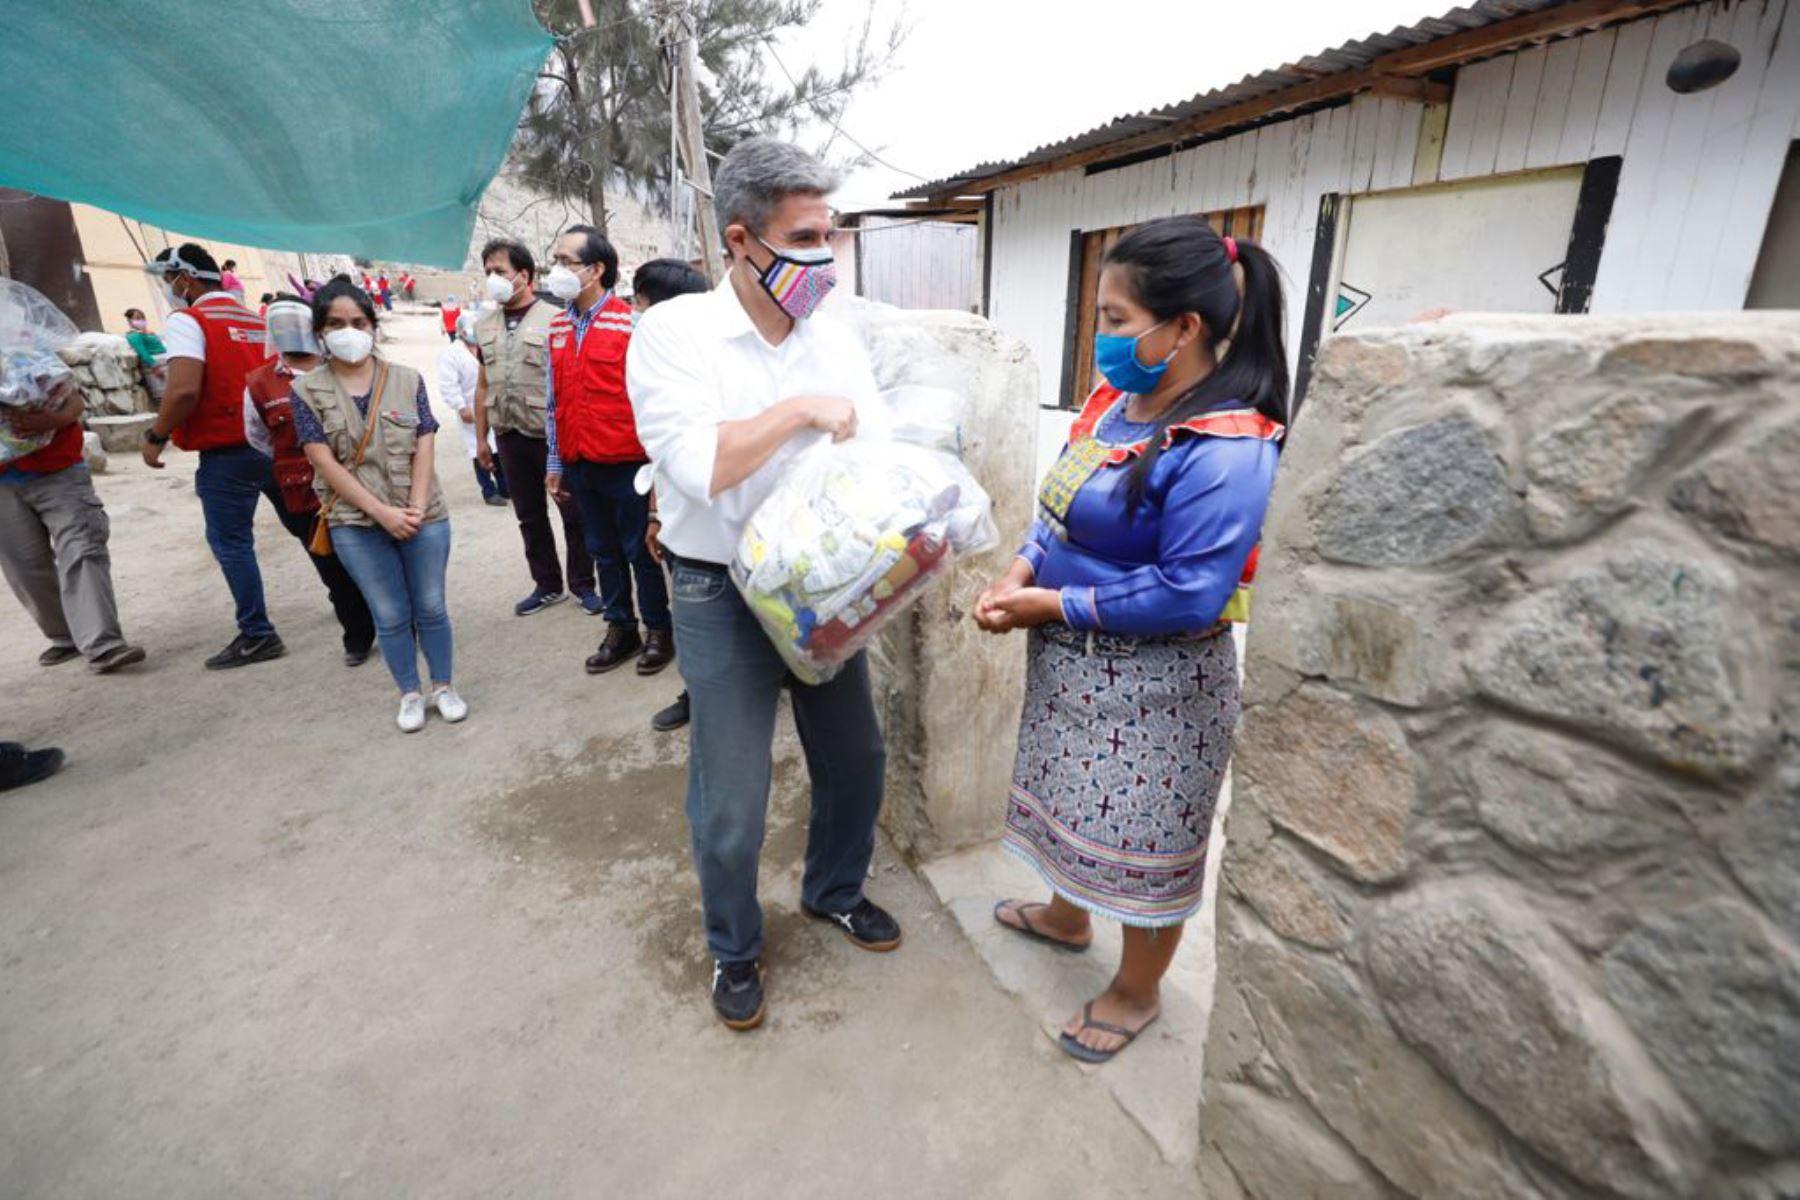 Ministro de Cultura, Alejandro Neyra supervisó la entrega de alimentos a la población Shipibo-Konibo asentada en Santa Eulalia. Foto: Mincul